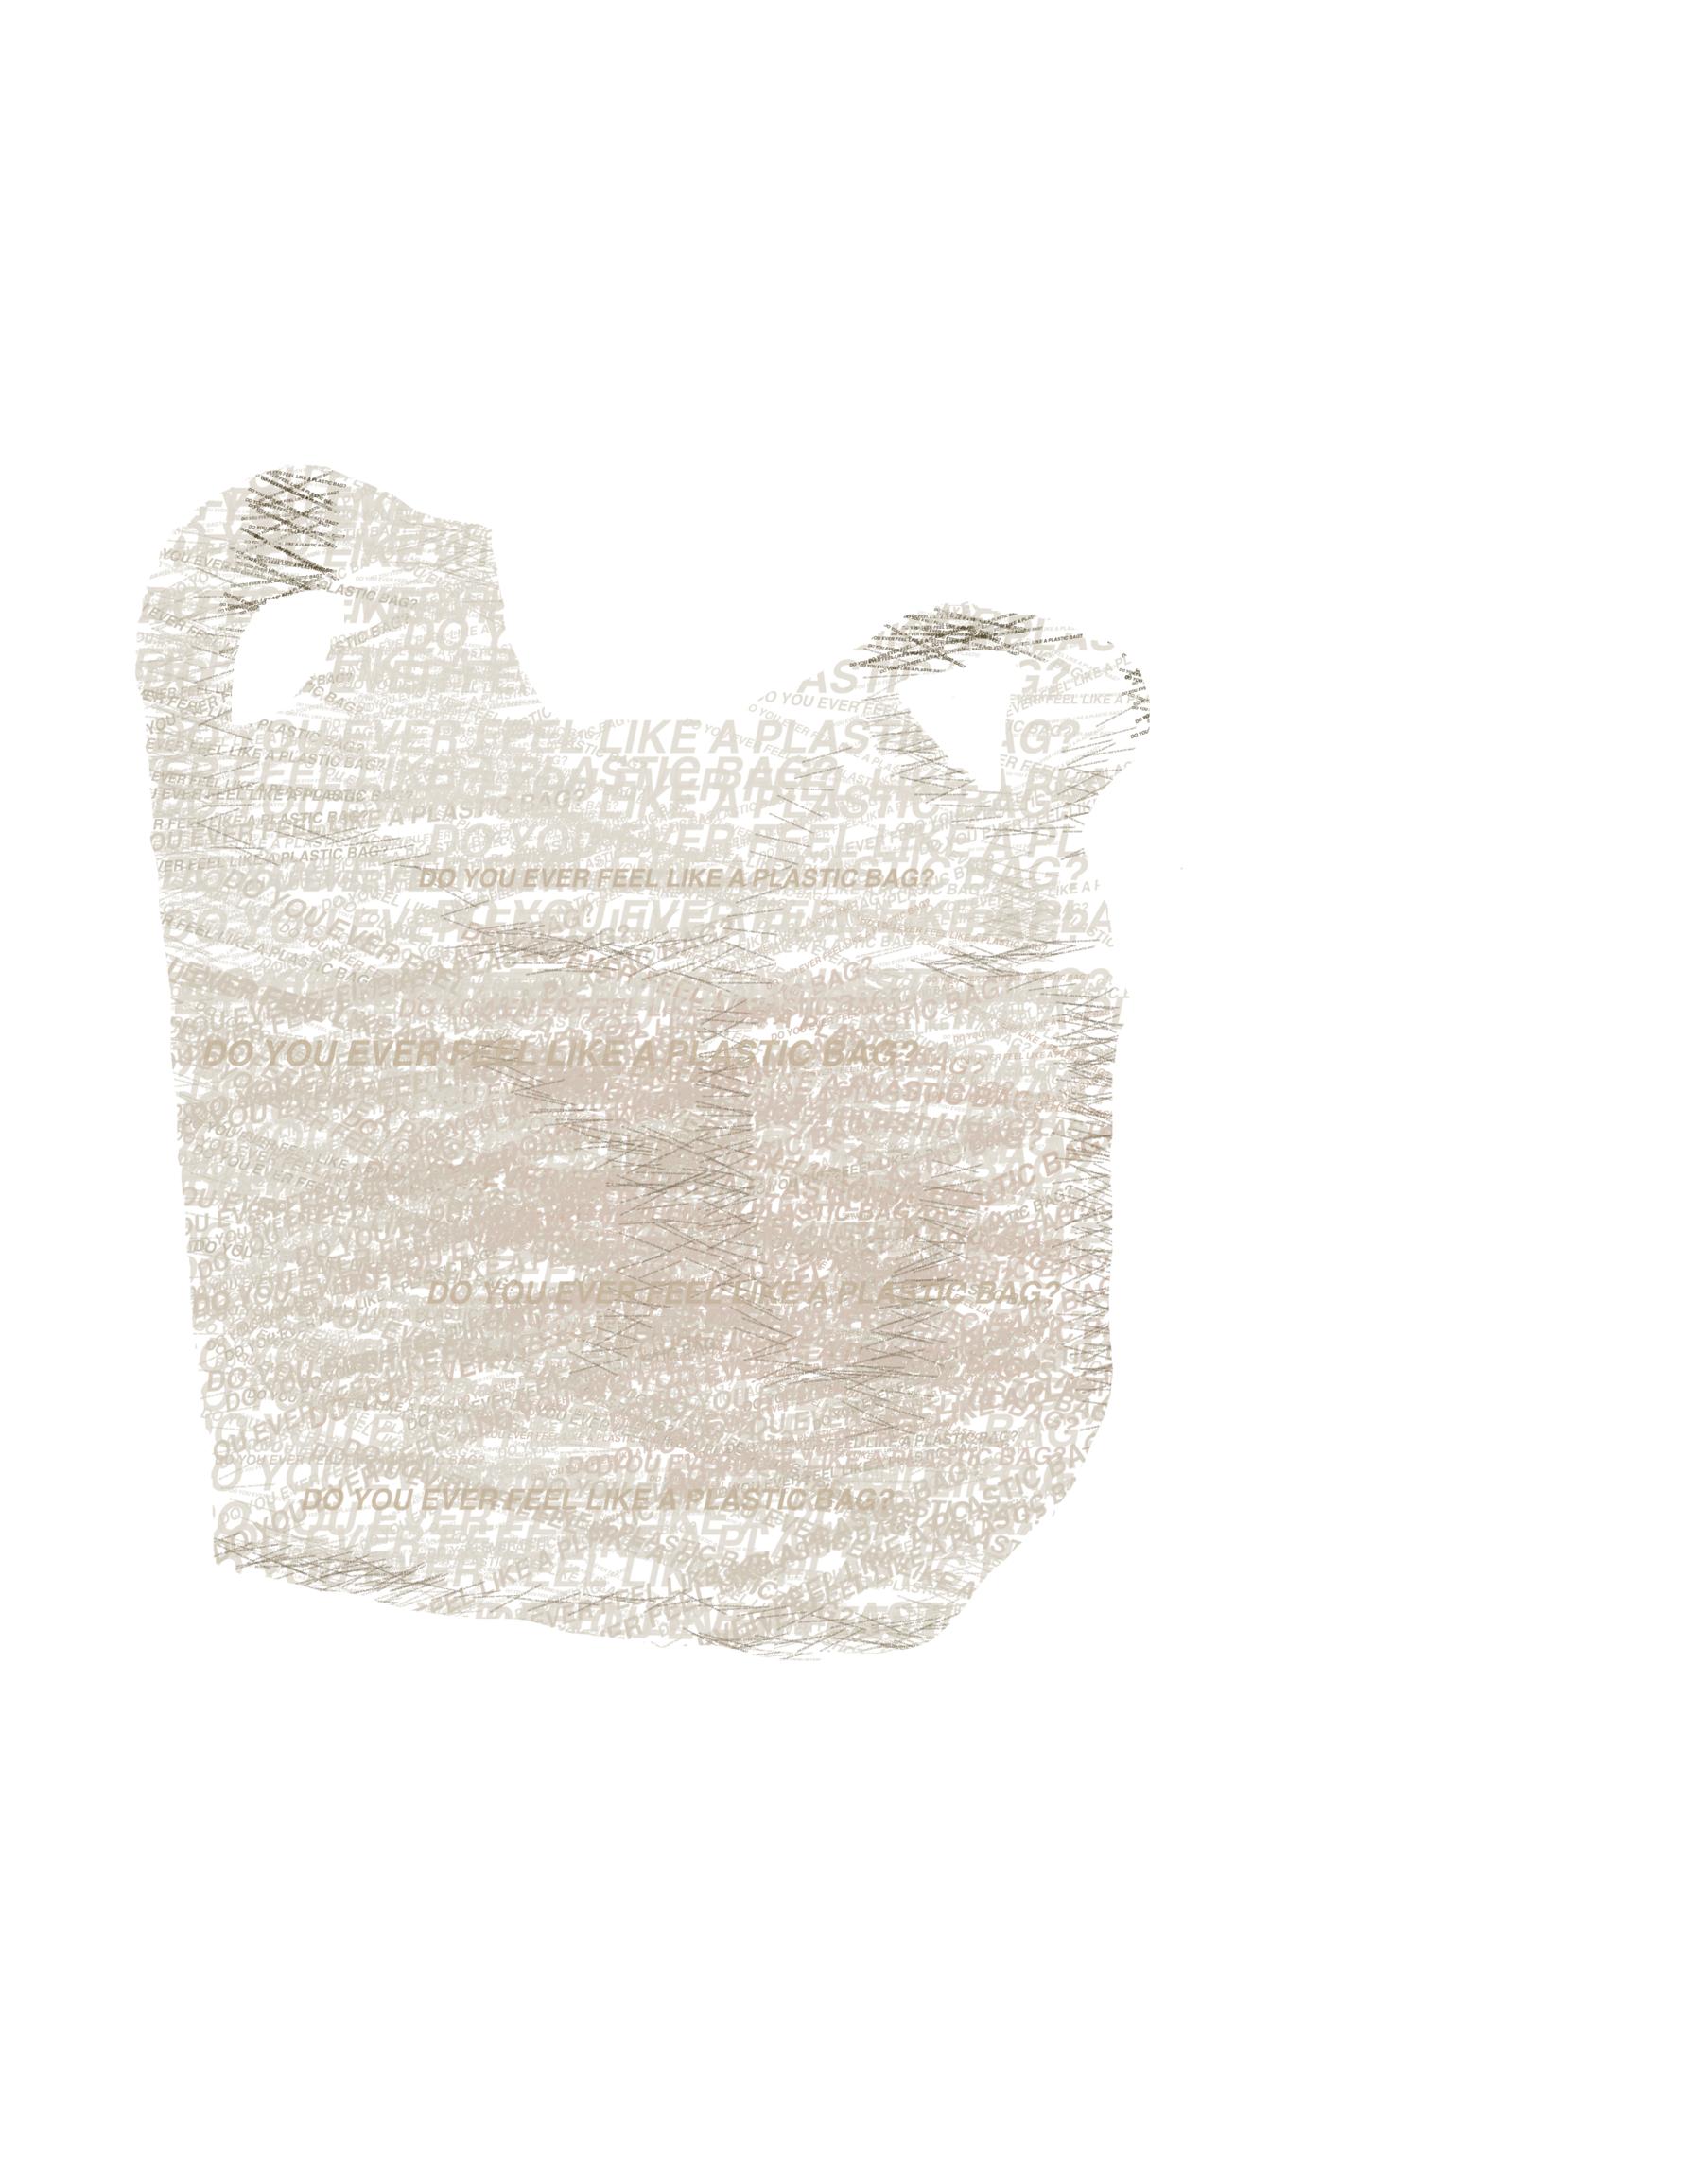 Do you ever feel like a plastic bag?